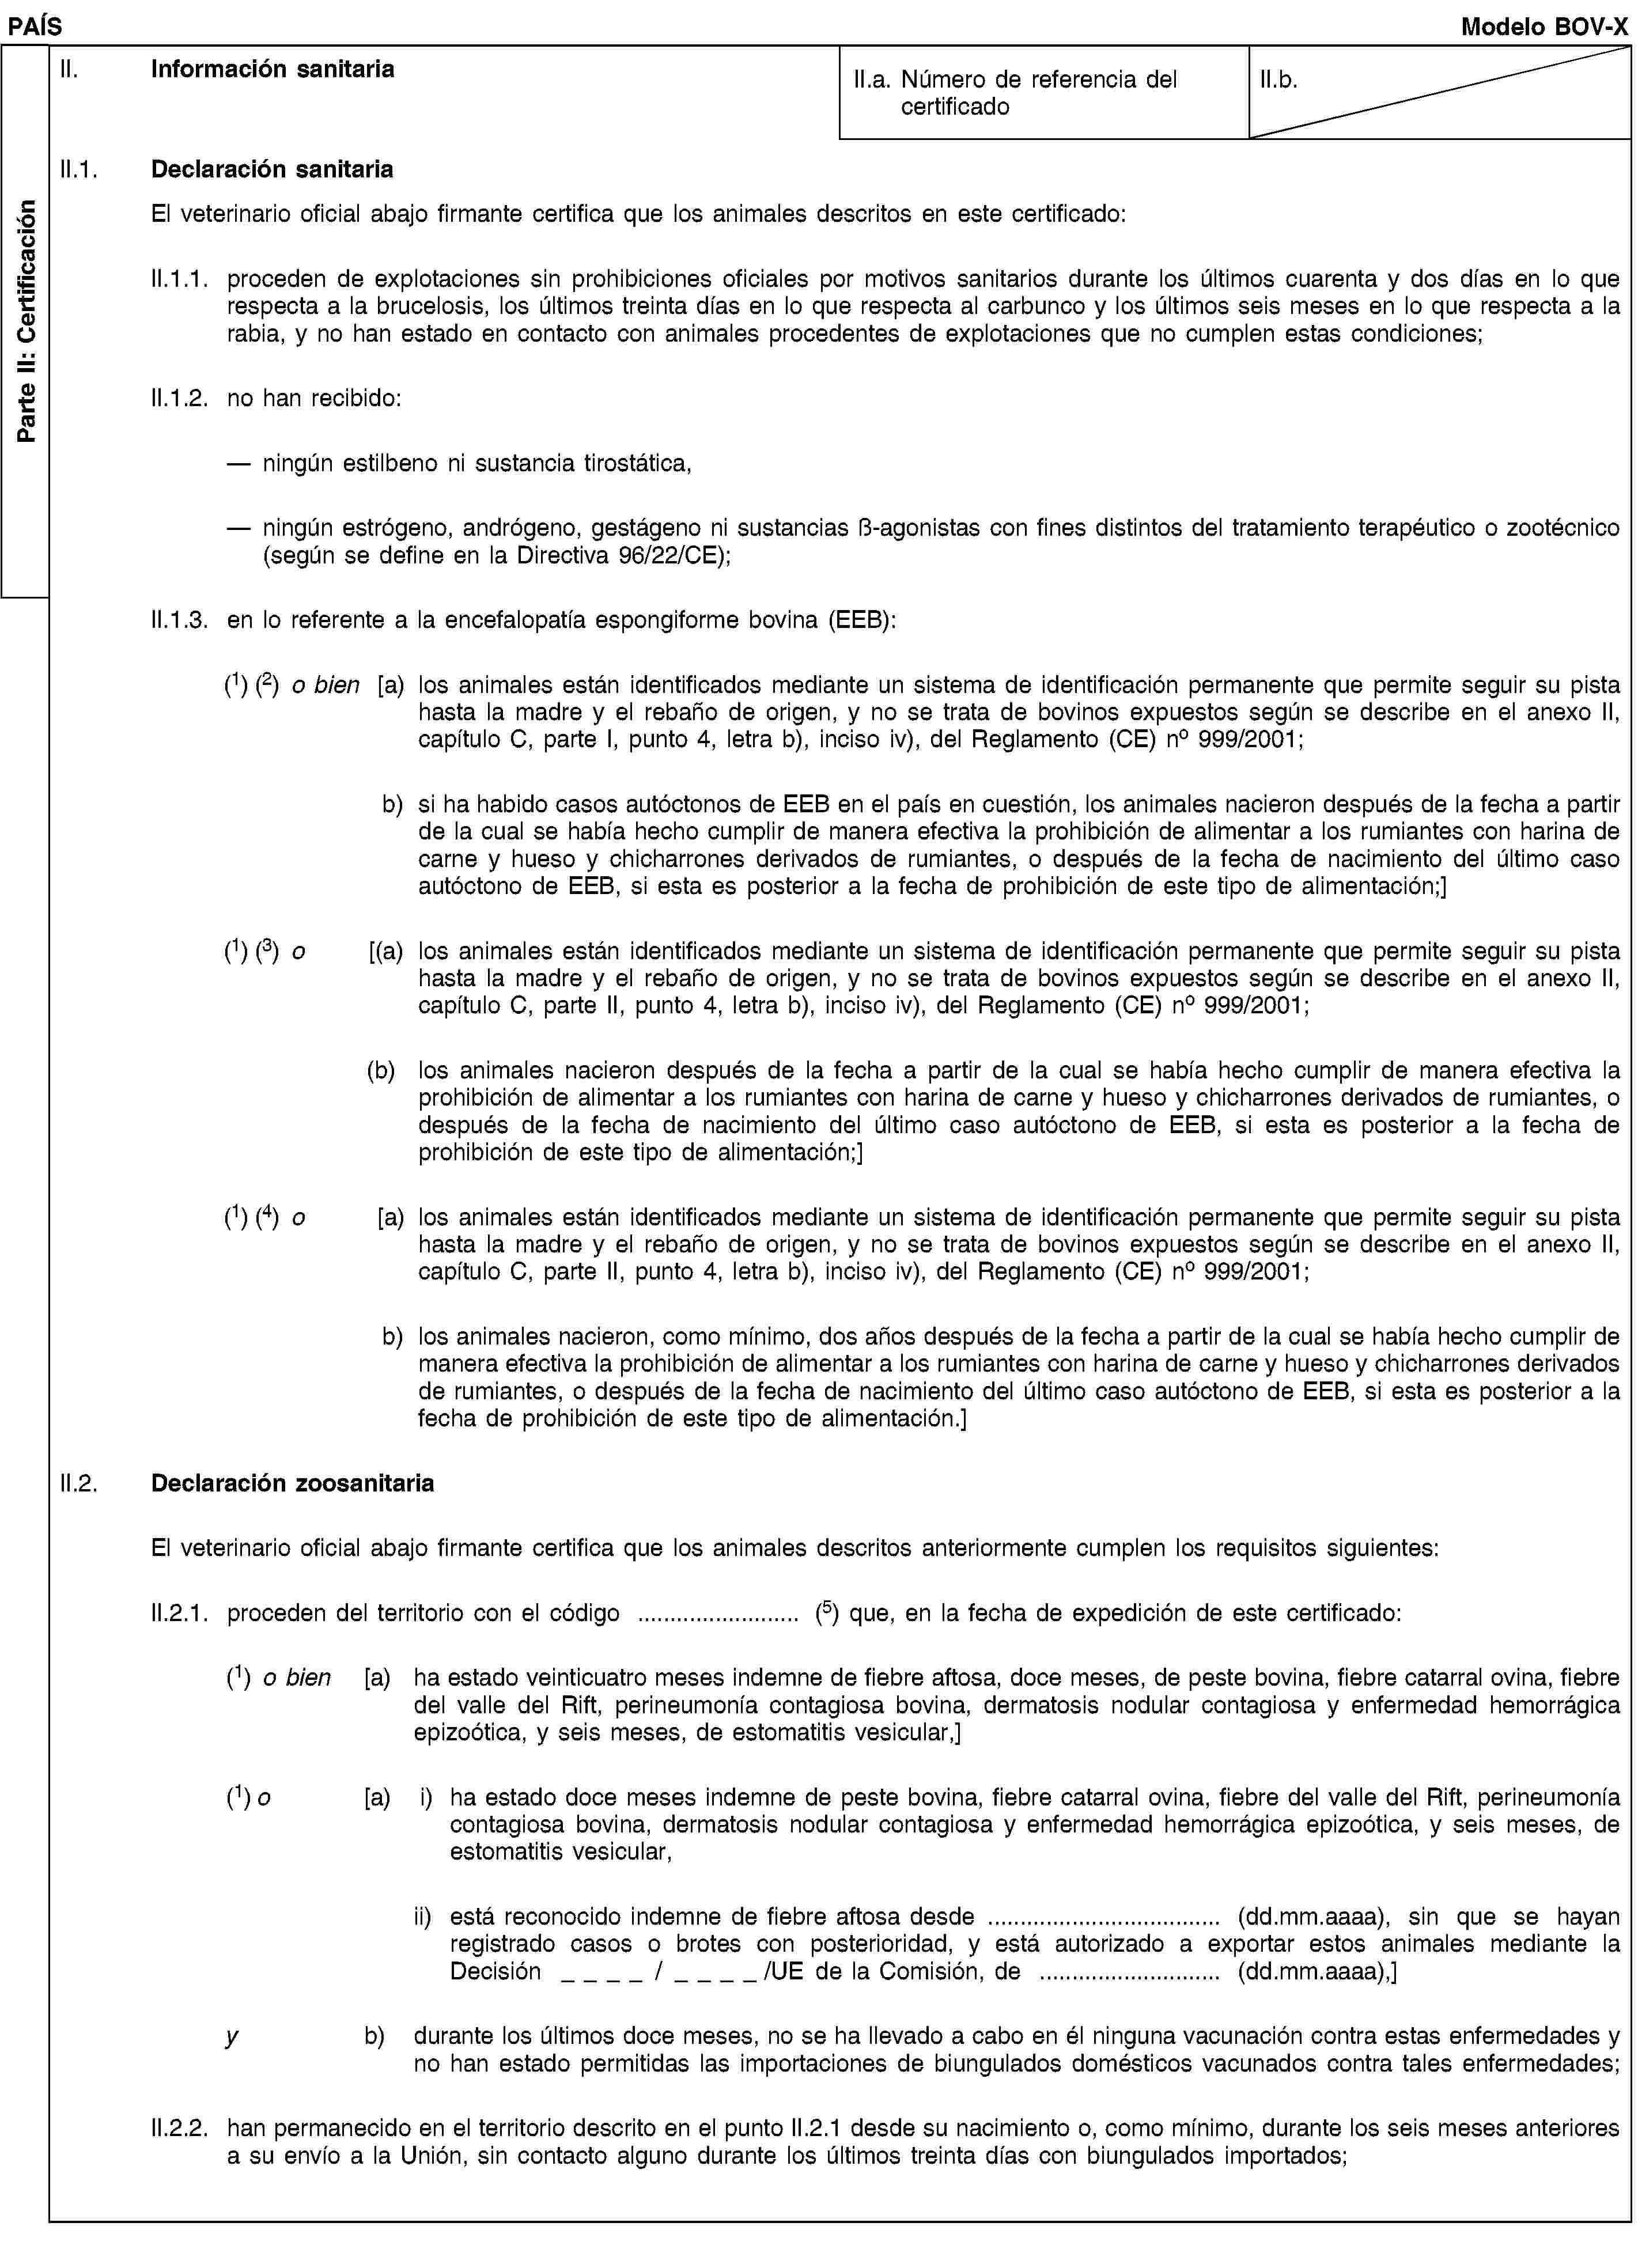 EUR-Lex - 02010R0206-20110412 - EN - EUR-Lex